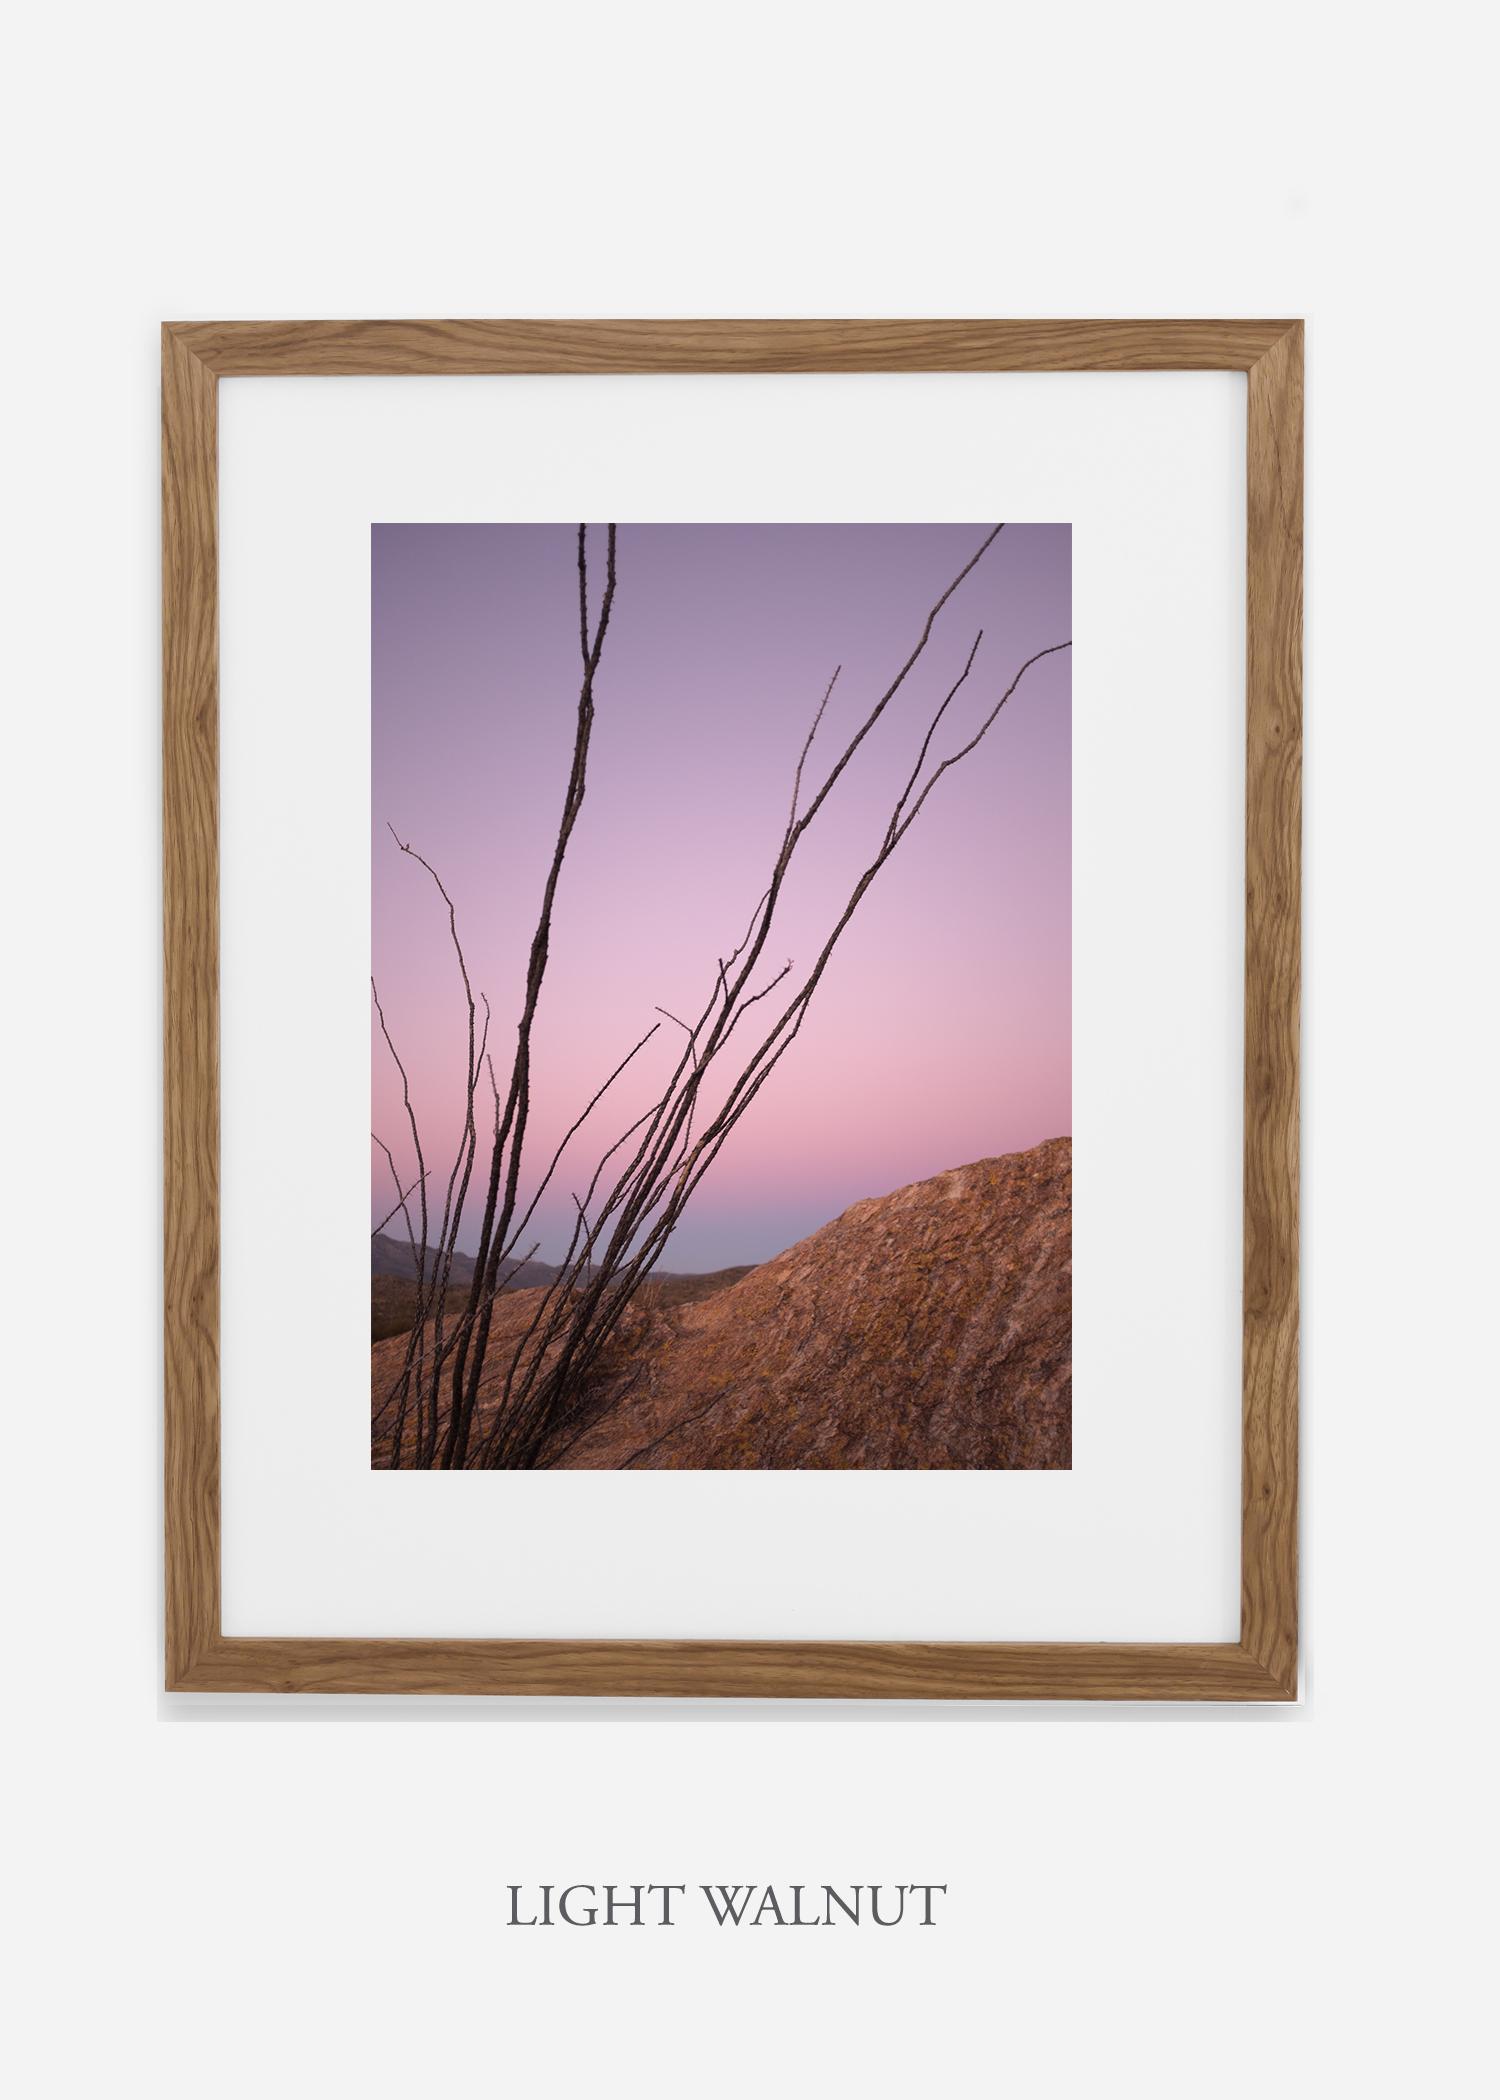 lightwalnutframe-saguaroNo.12-wildercalifornia-art-wallart-cactusprint-homedecor-prints-arizona-botanical-artwork-interiordesign.jpg